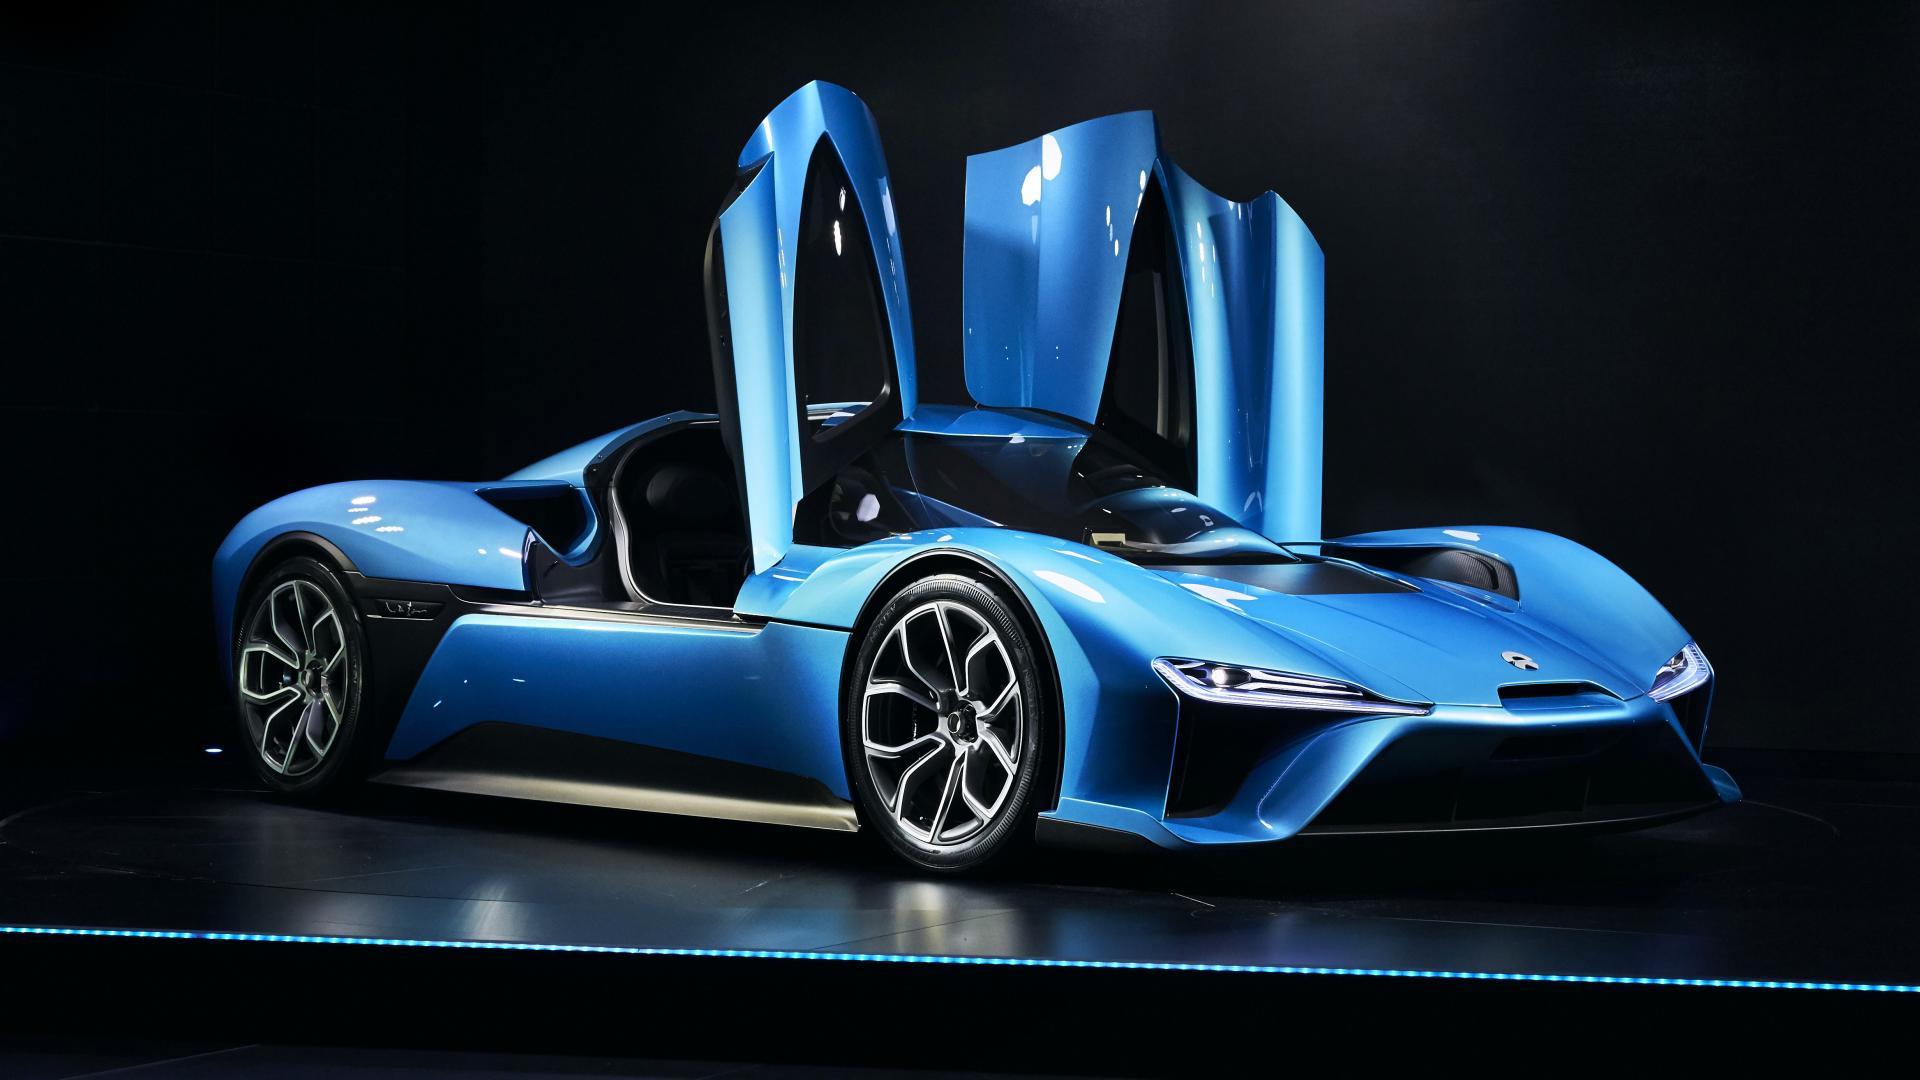 Blue car with doors that open upward.